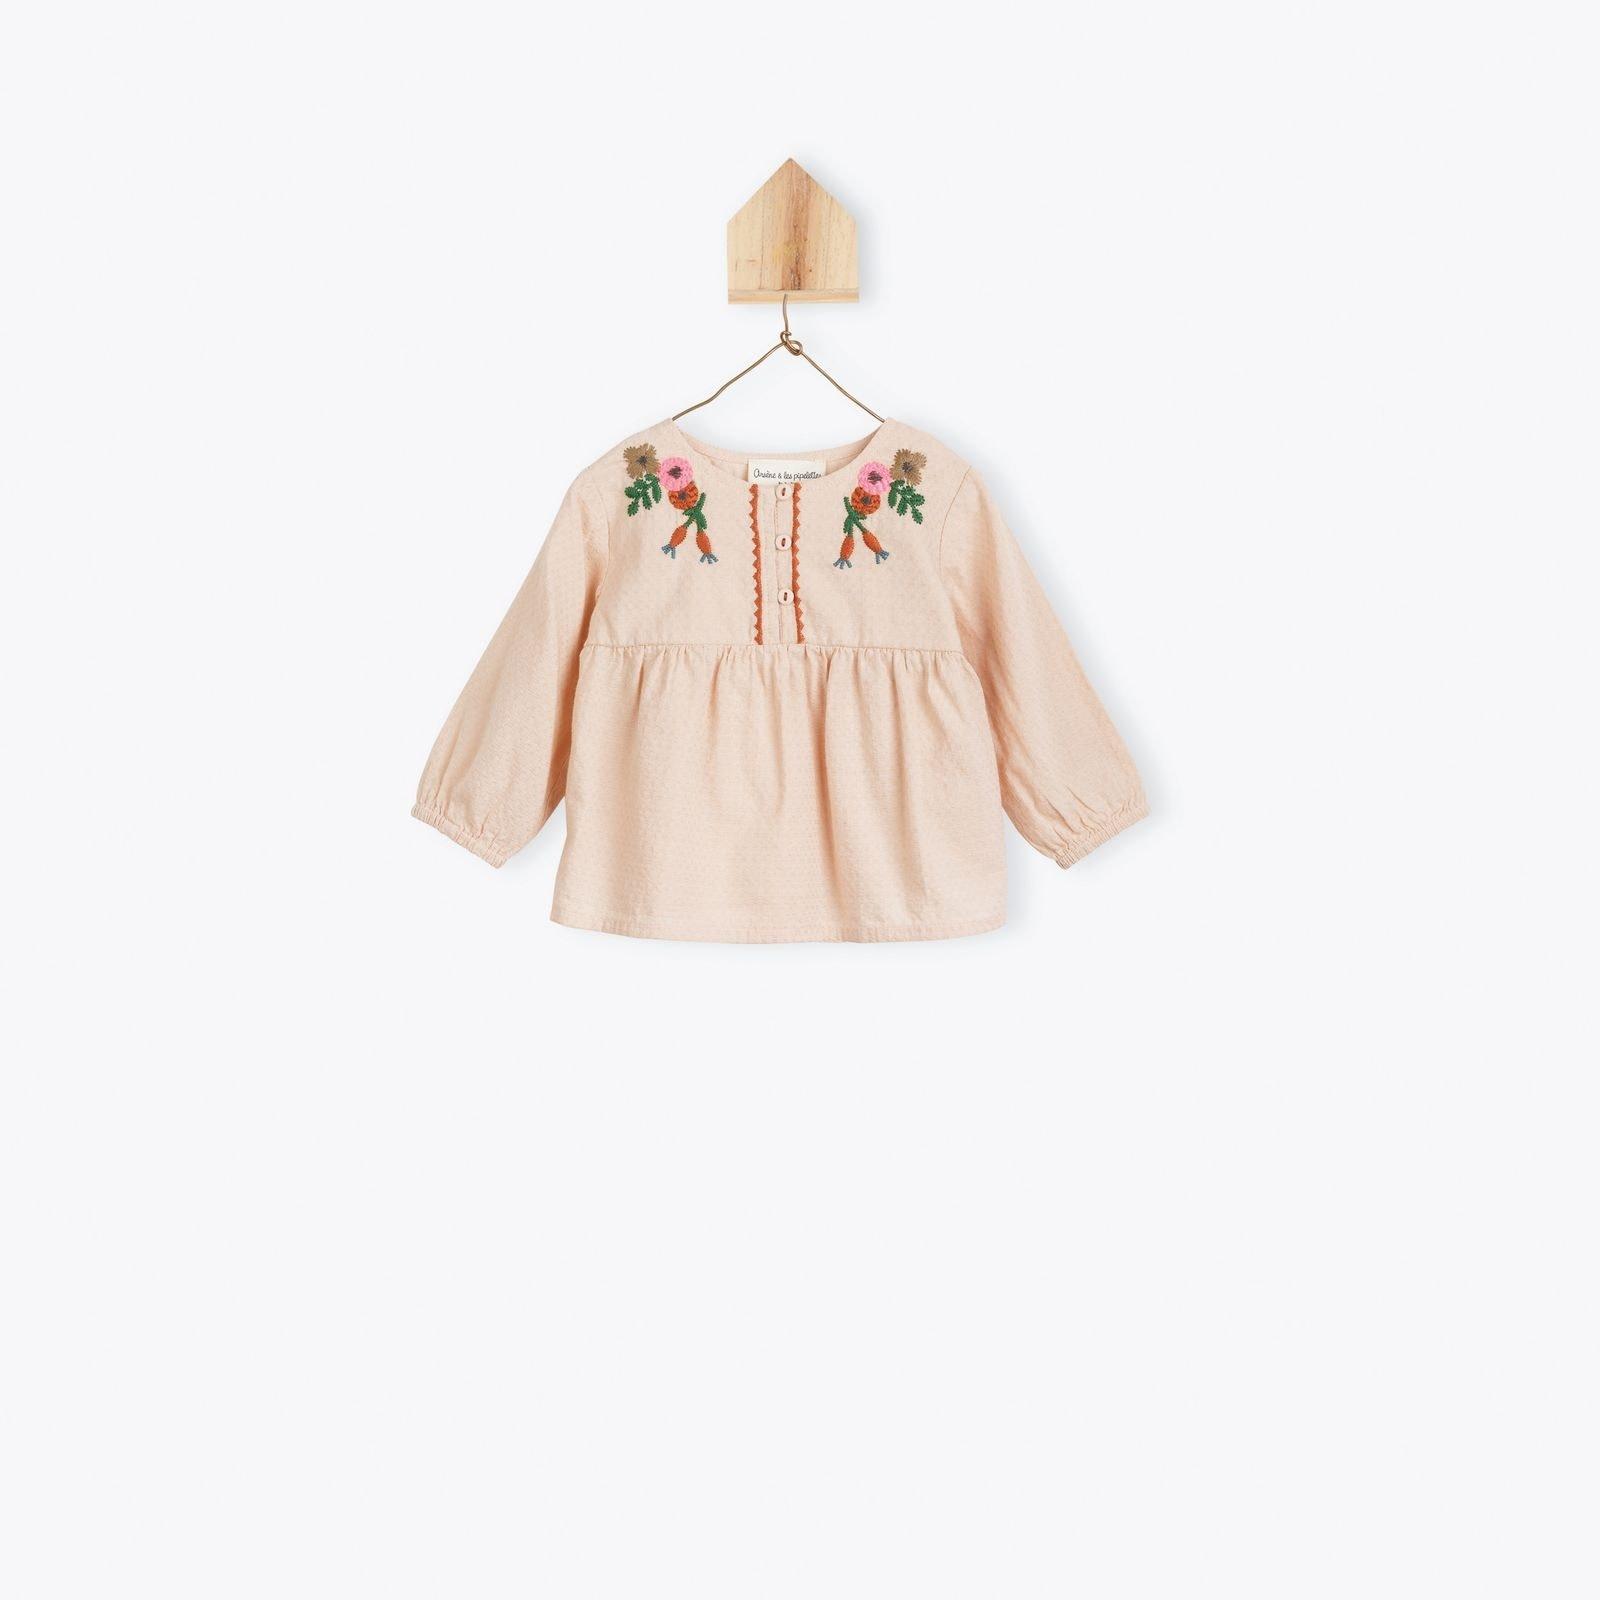 Arsène et les Pipelettes Powder embroedered baby blouse